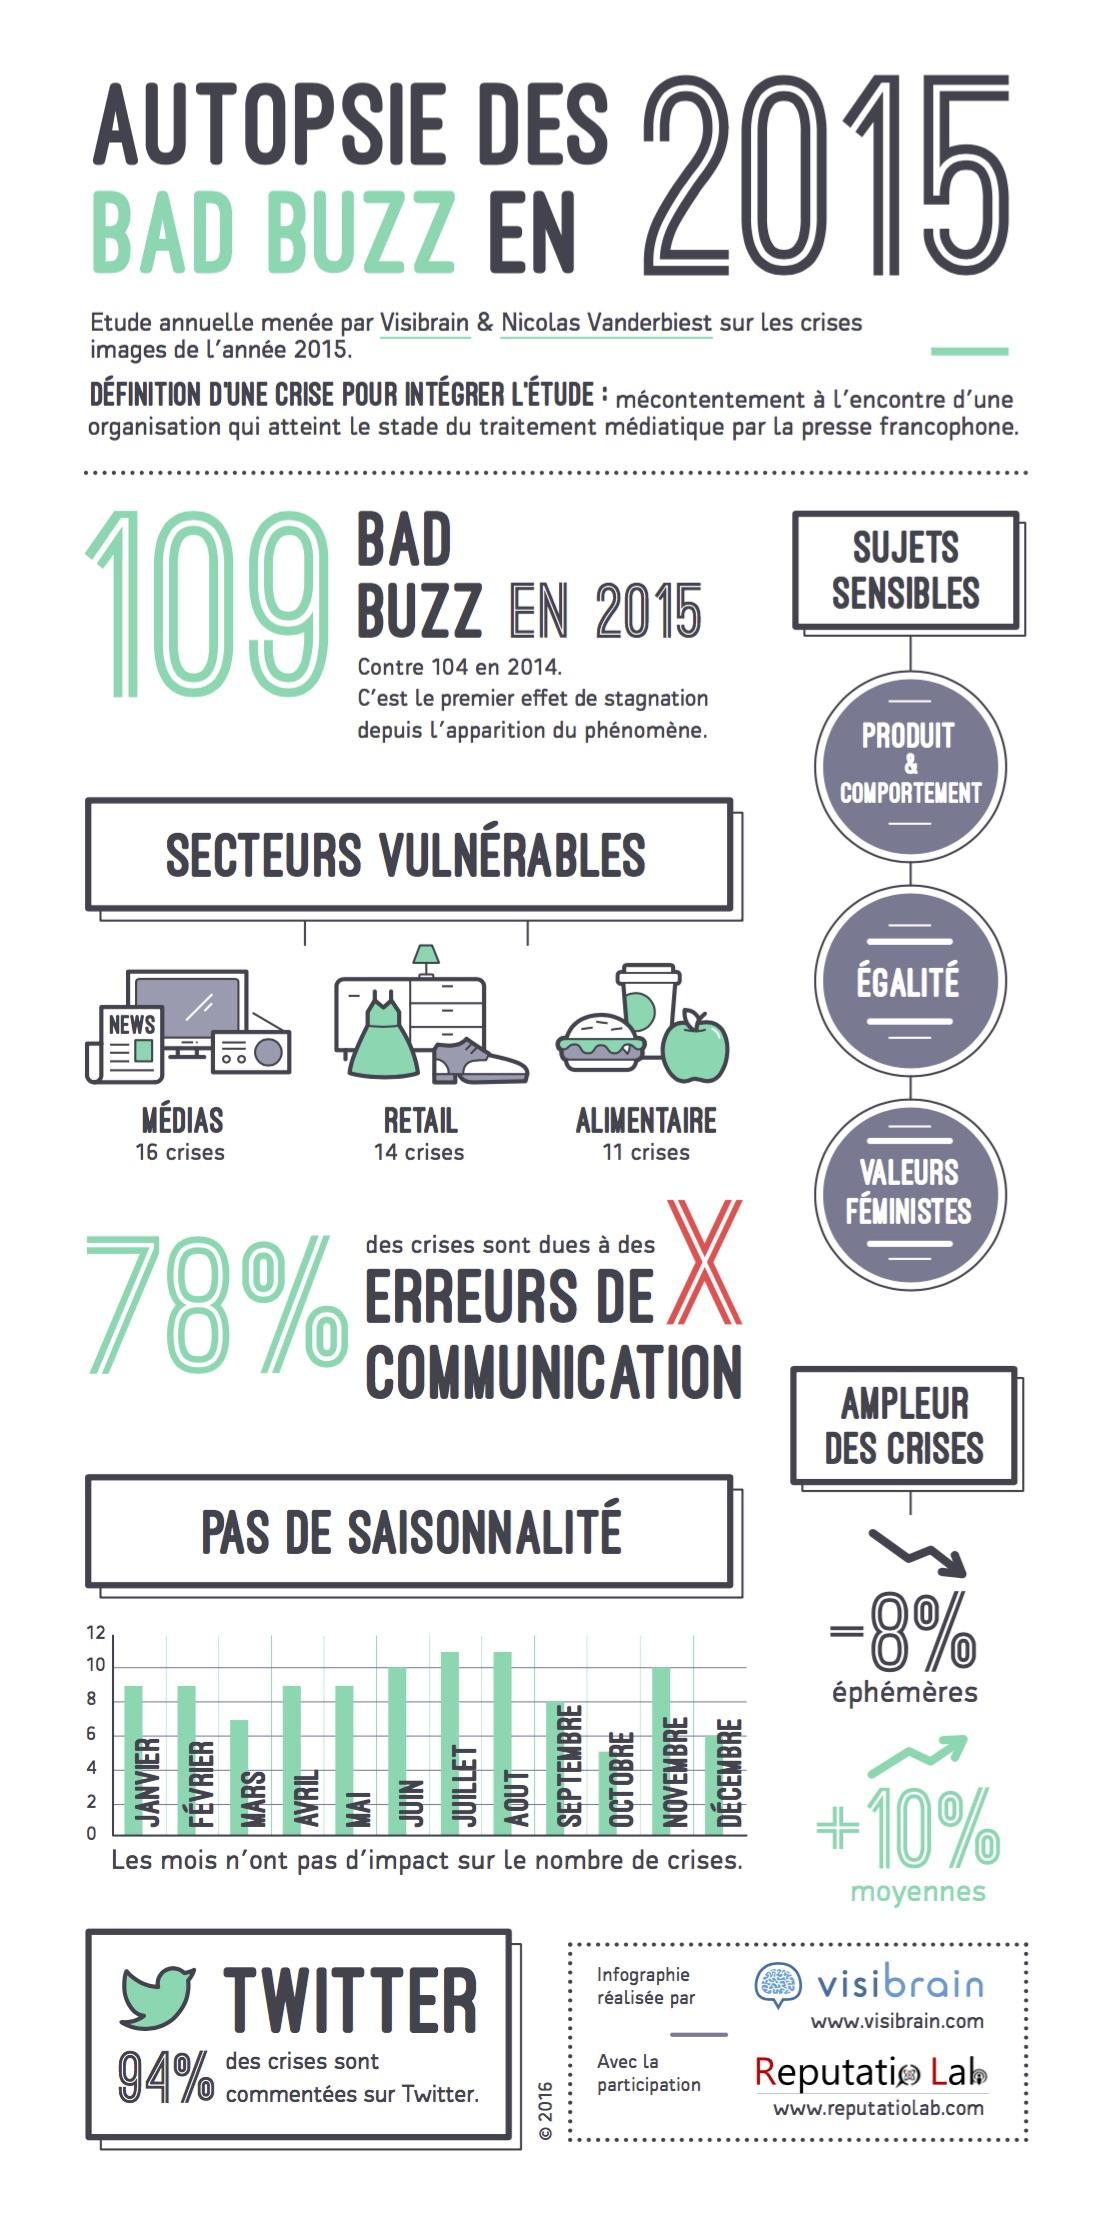 visibrain-infographie-badbuzz-2015